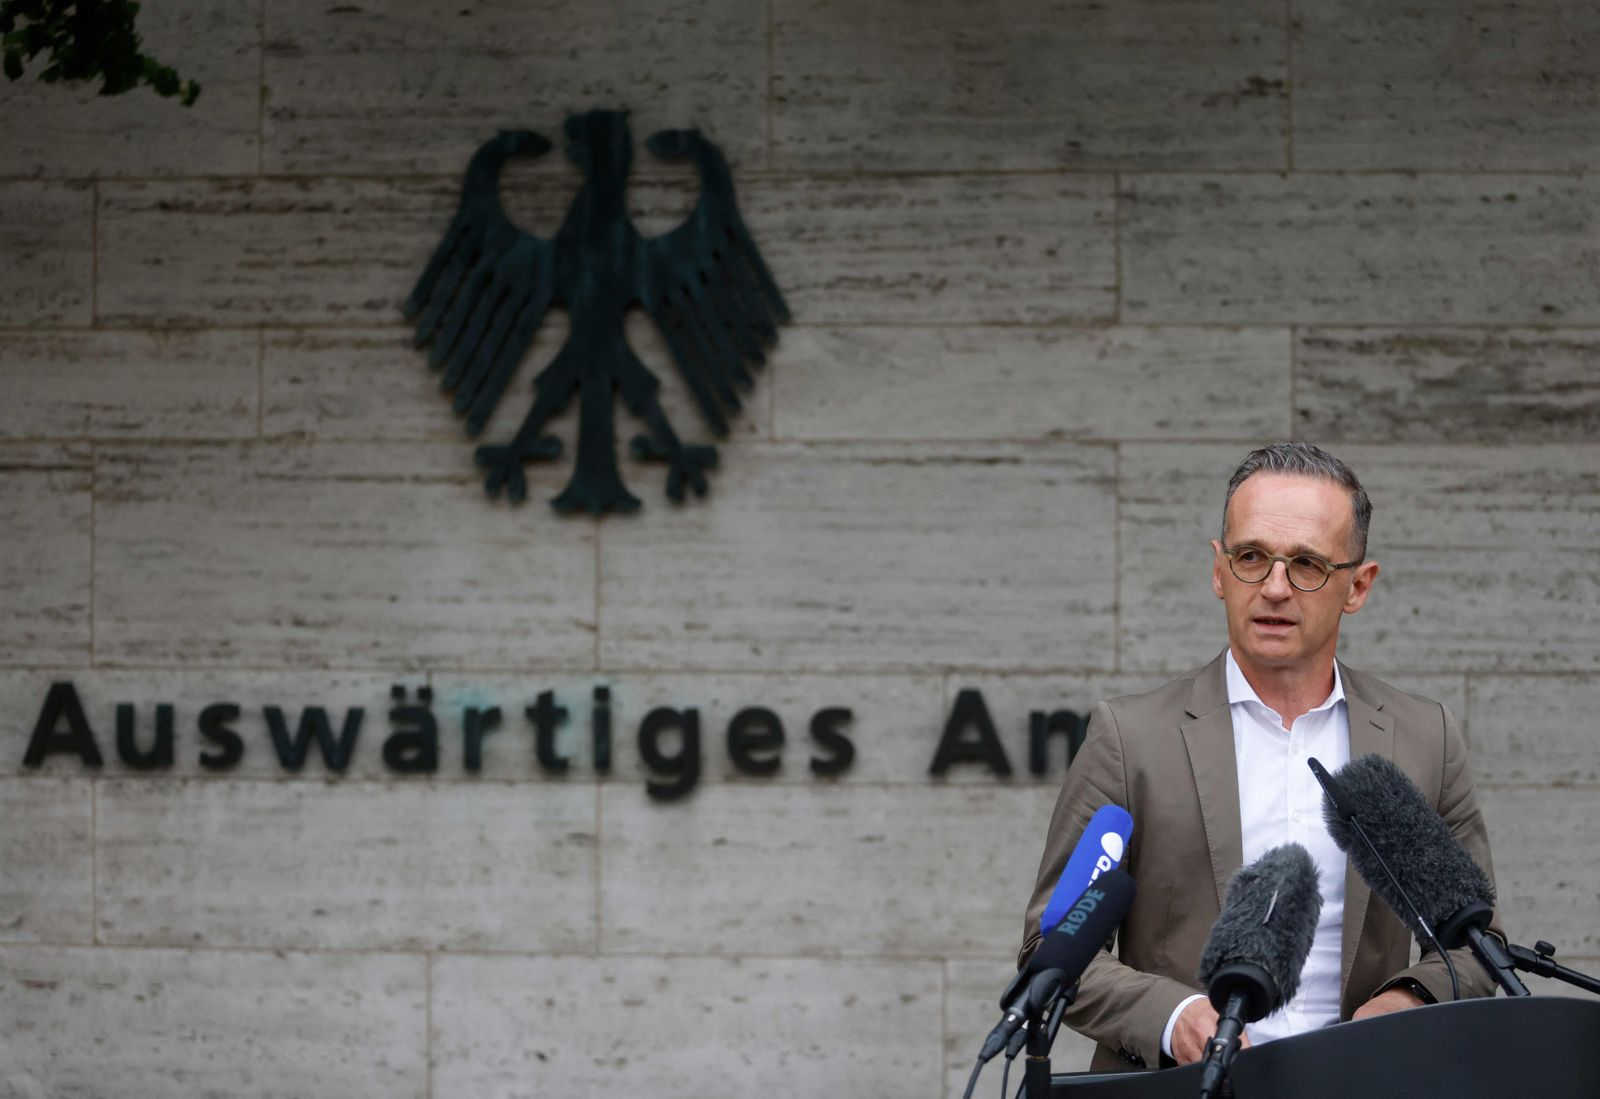 GERMAN-AFGHANISTAN-POLITICS-DIPLOMACY-CONFLICT-EVACUATION